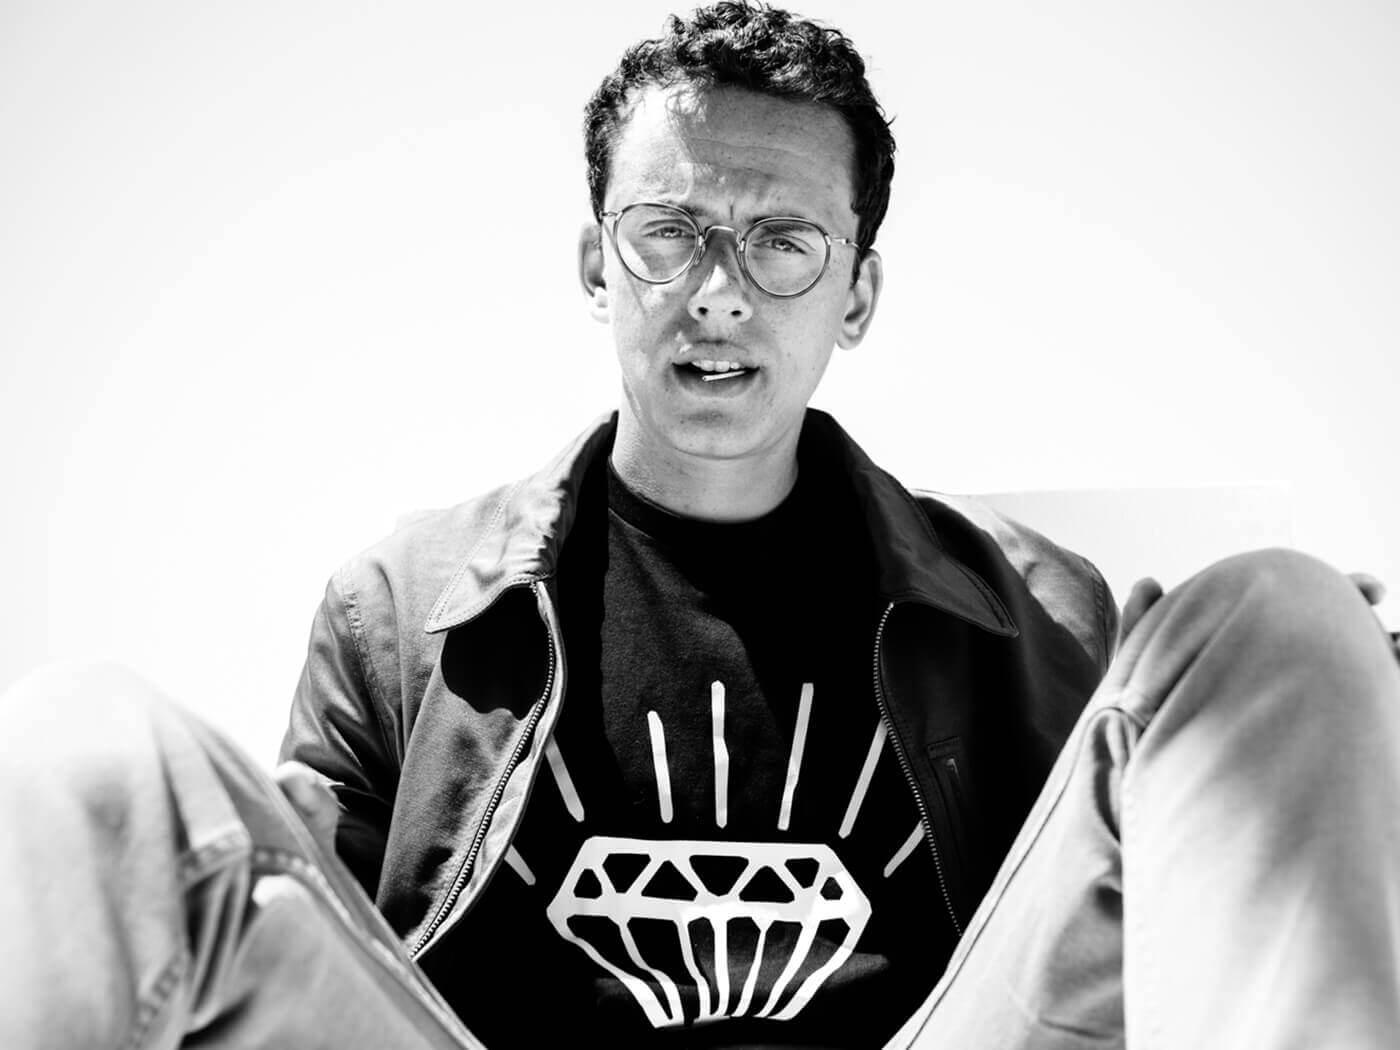 Logic, rapper